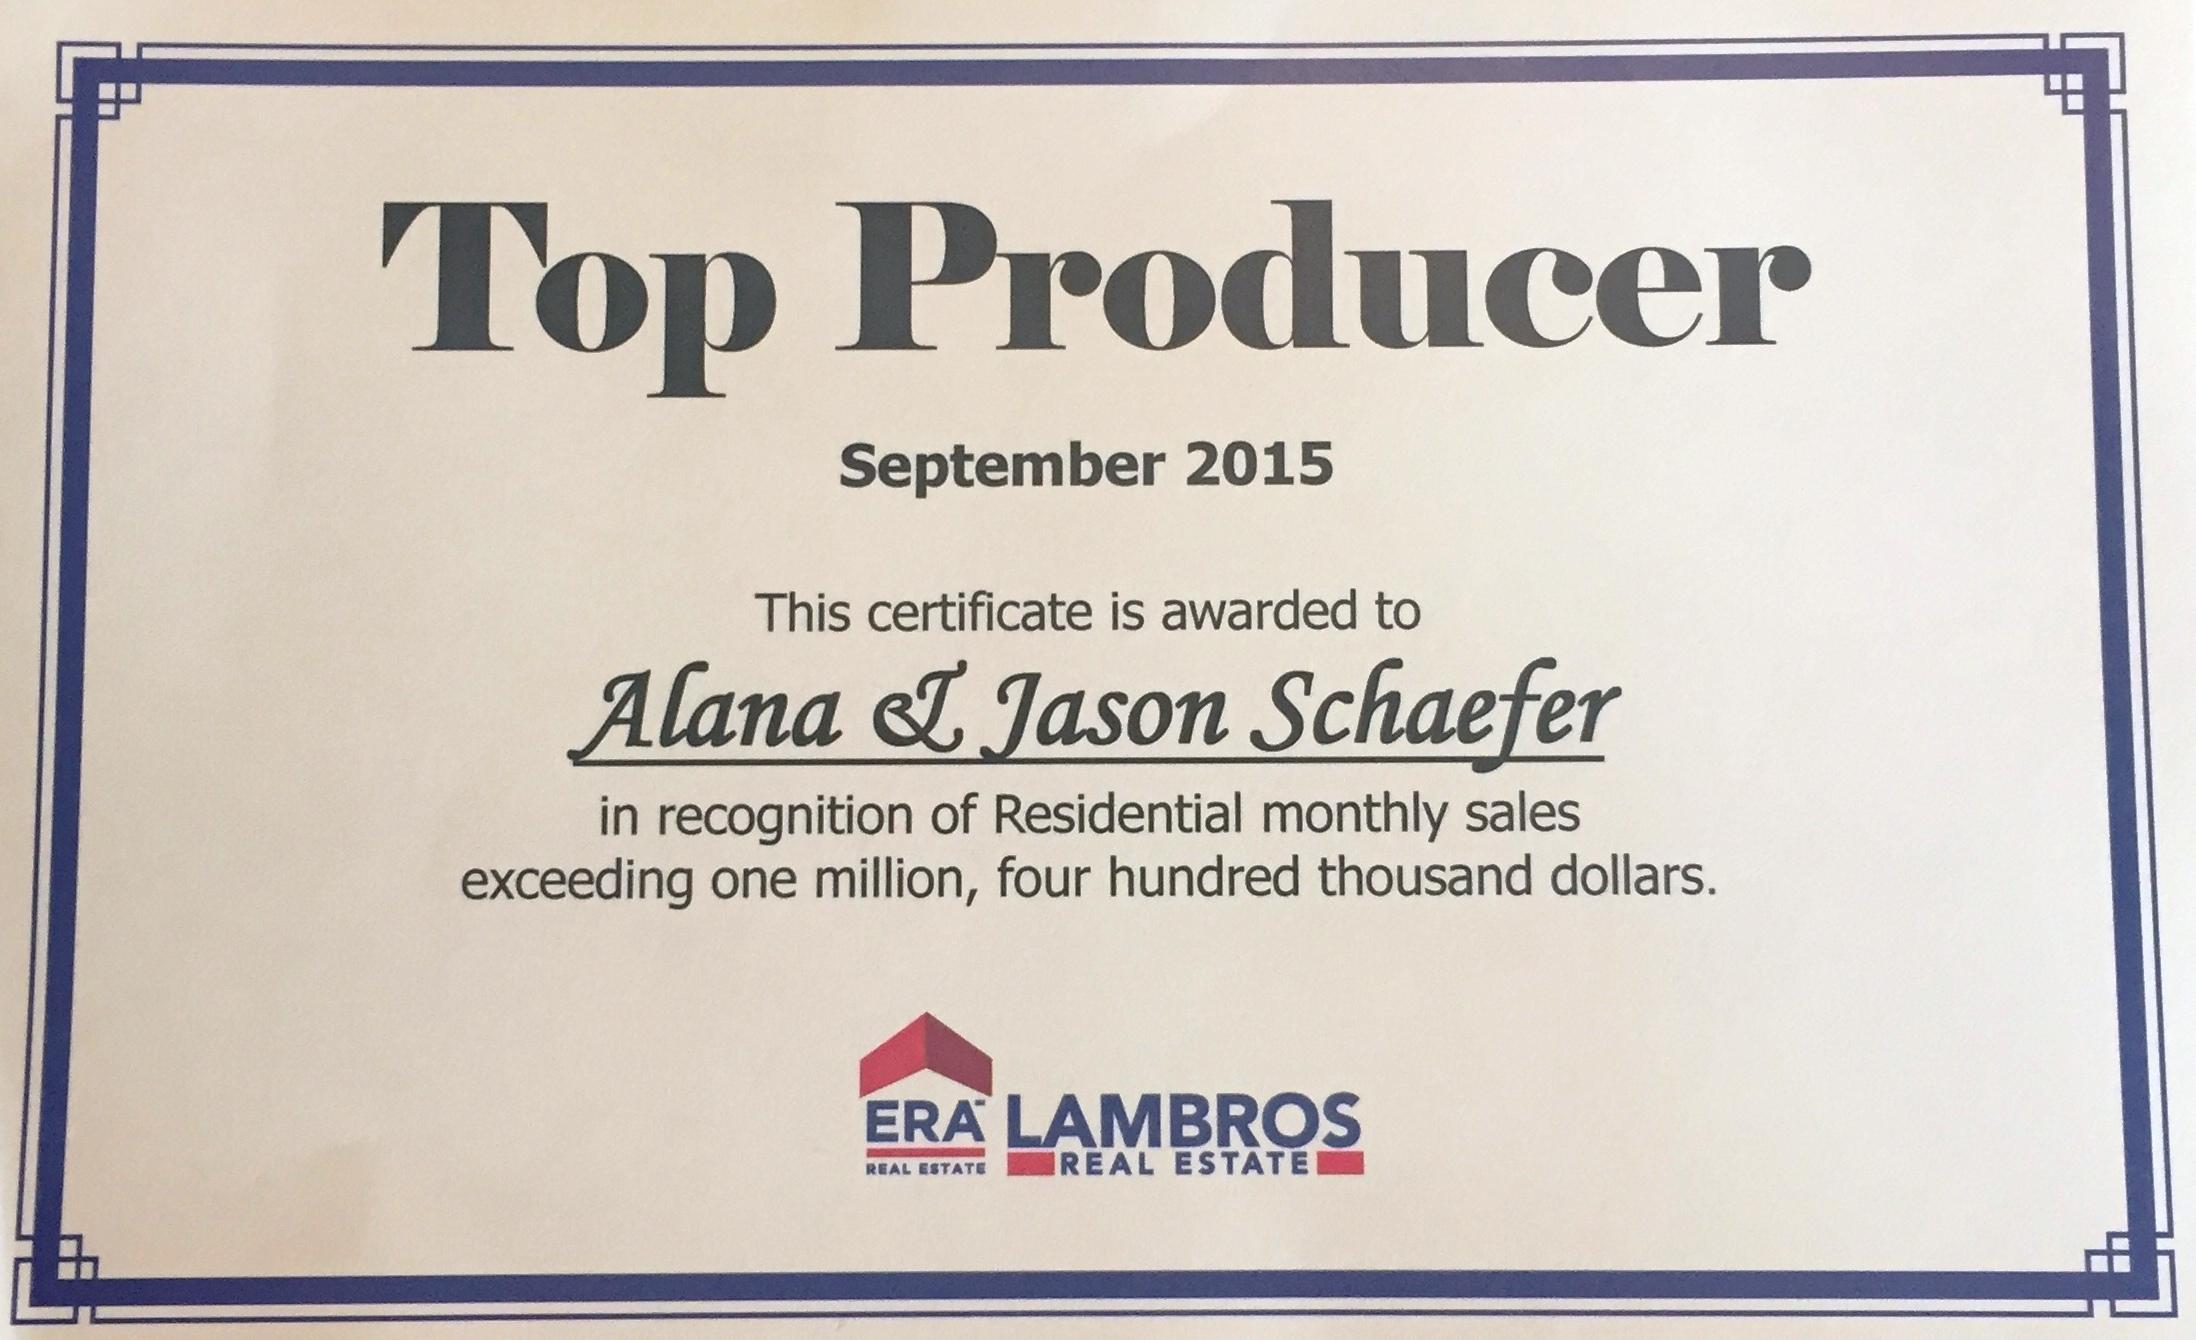 Alana Jason Top Producer Certificate September 2015.jpg